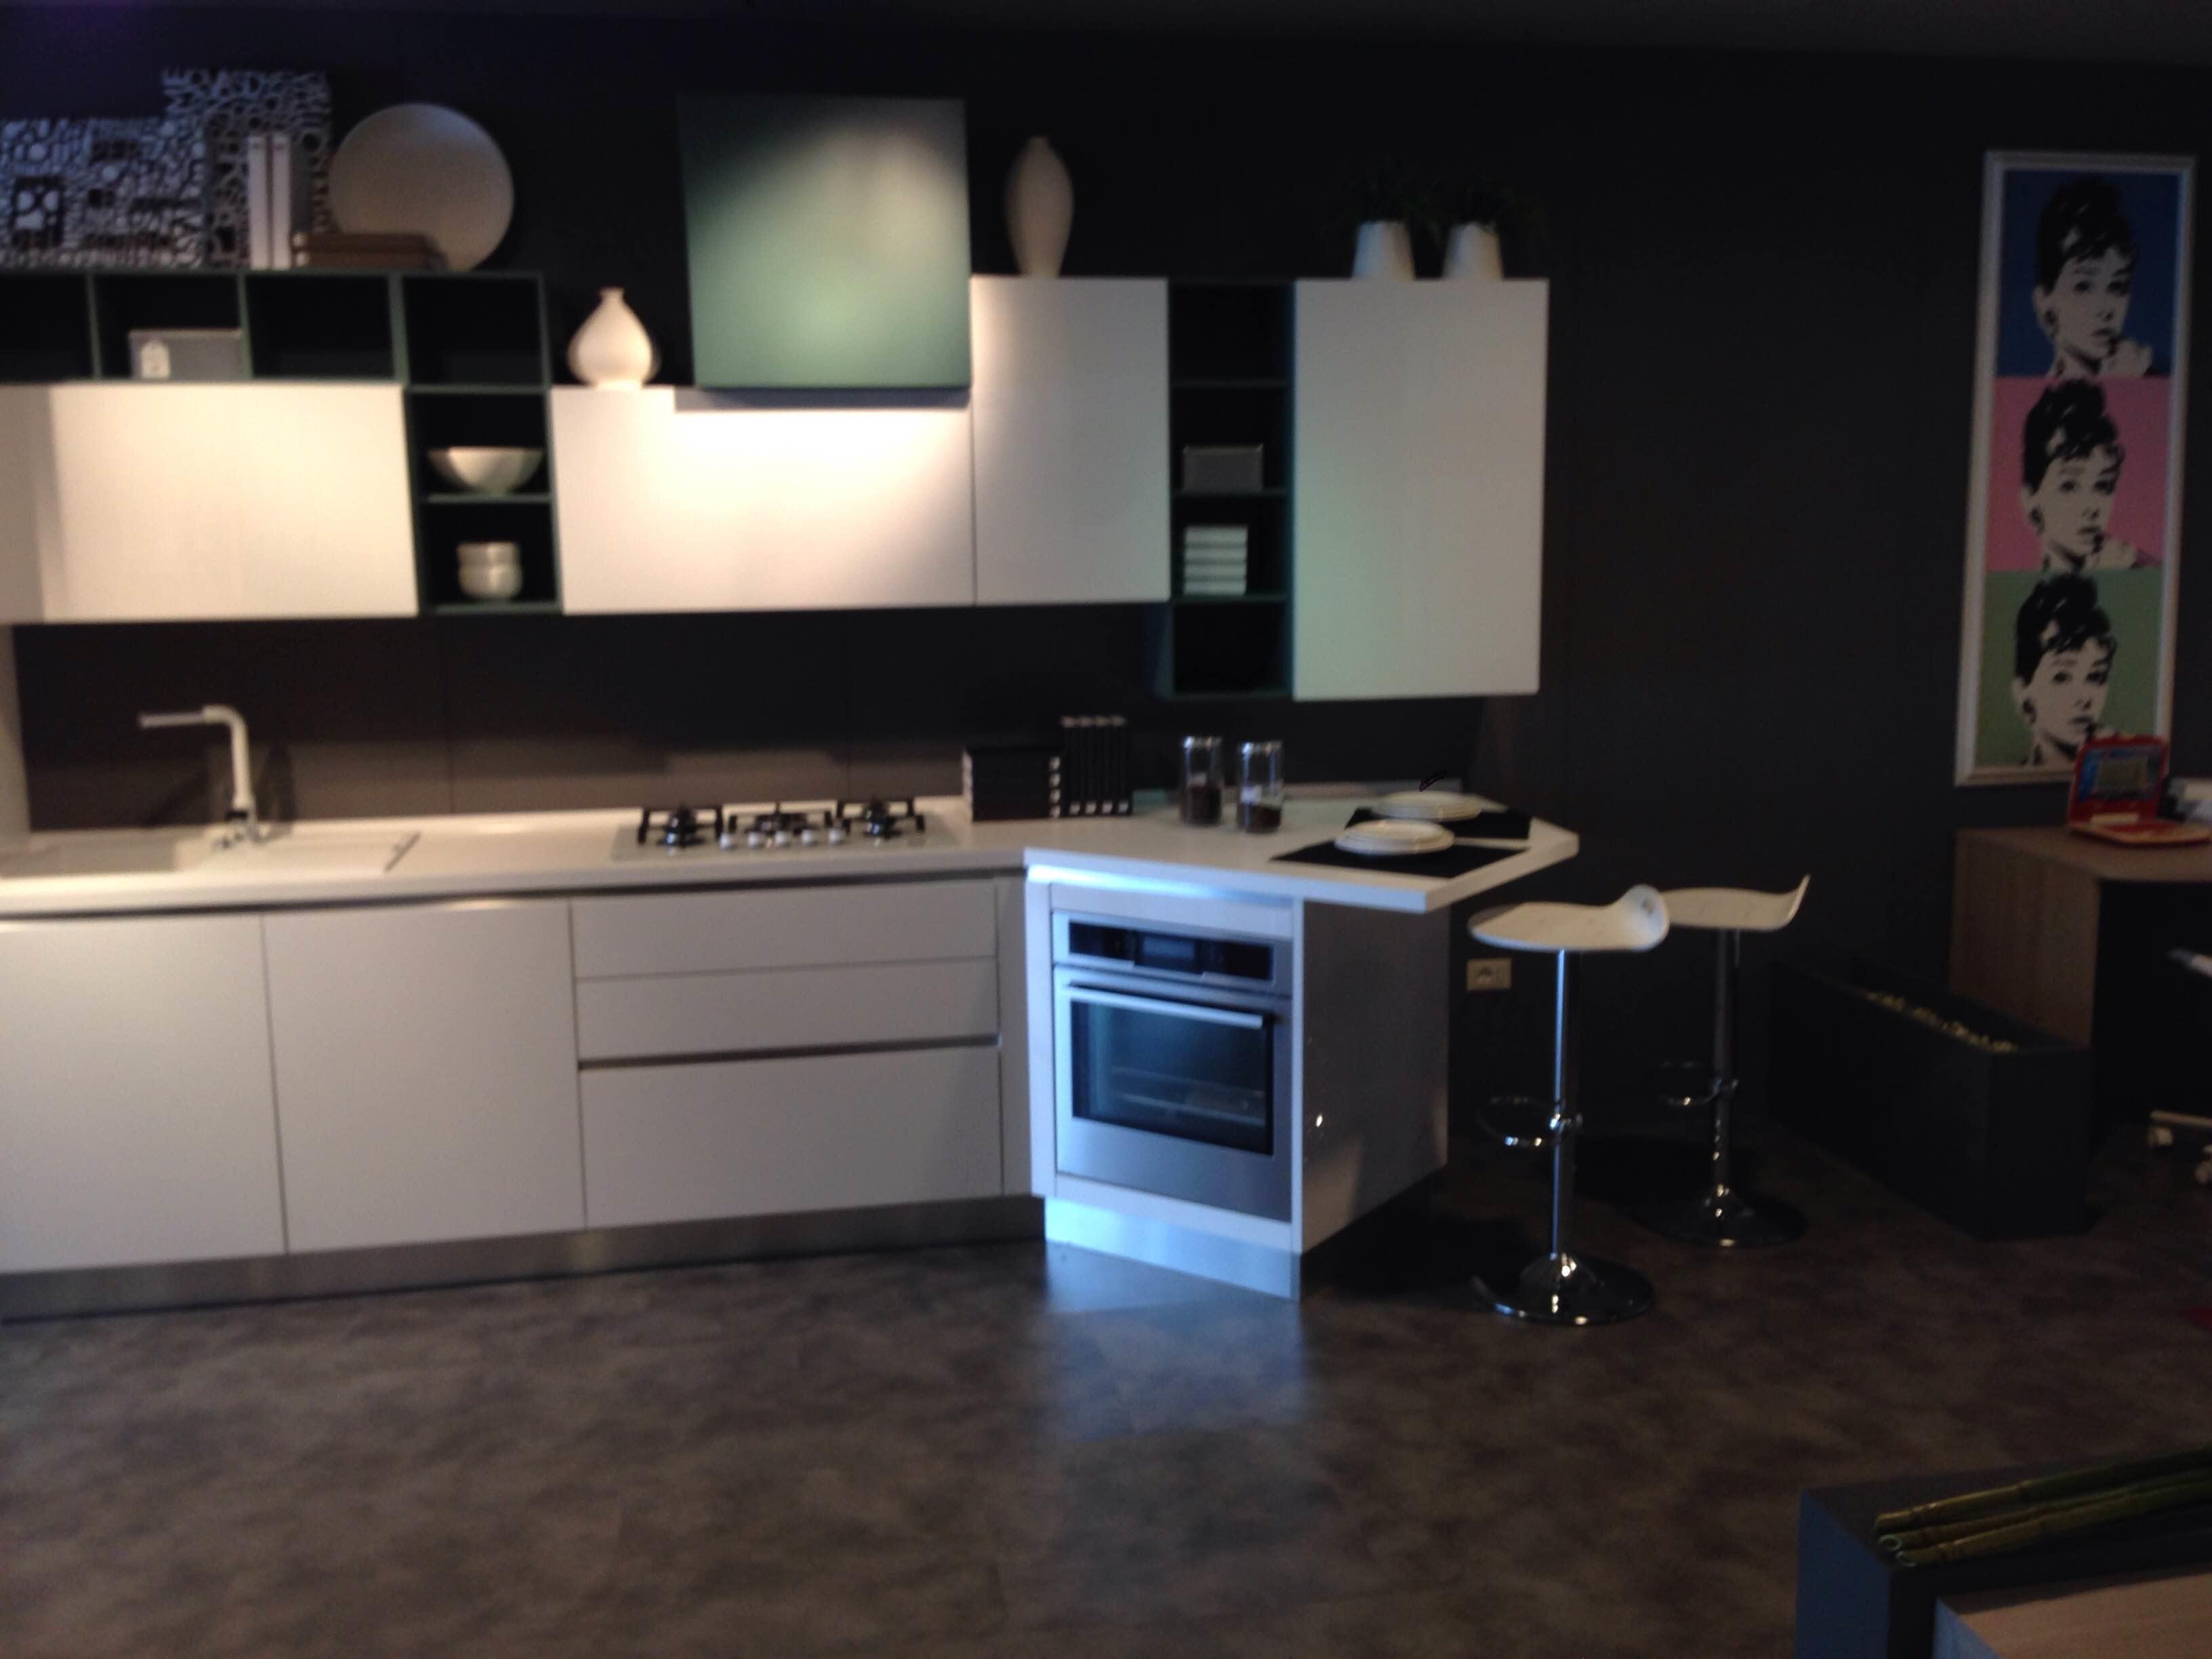 Cucina lube cucine immagina lux acrilico cucine a prezzi - Cucina lube immagina ...